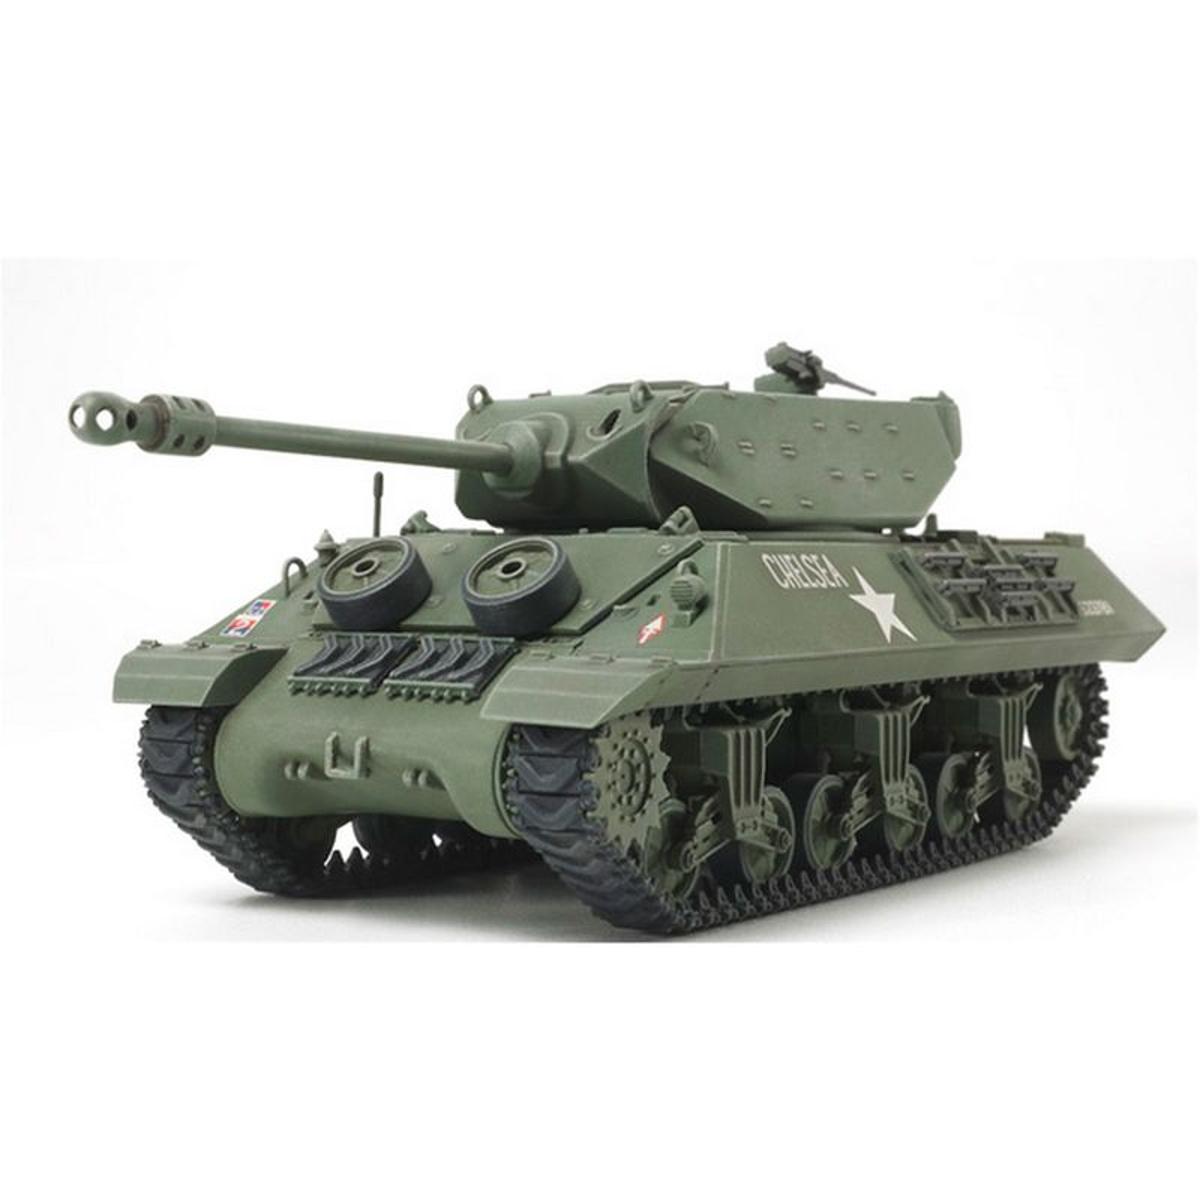 Maquette Char : M10 IIC Achilles